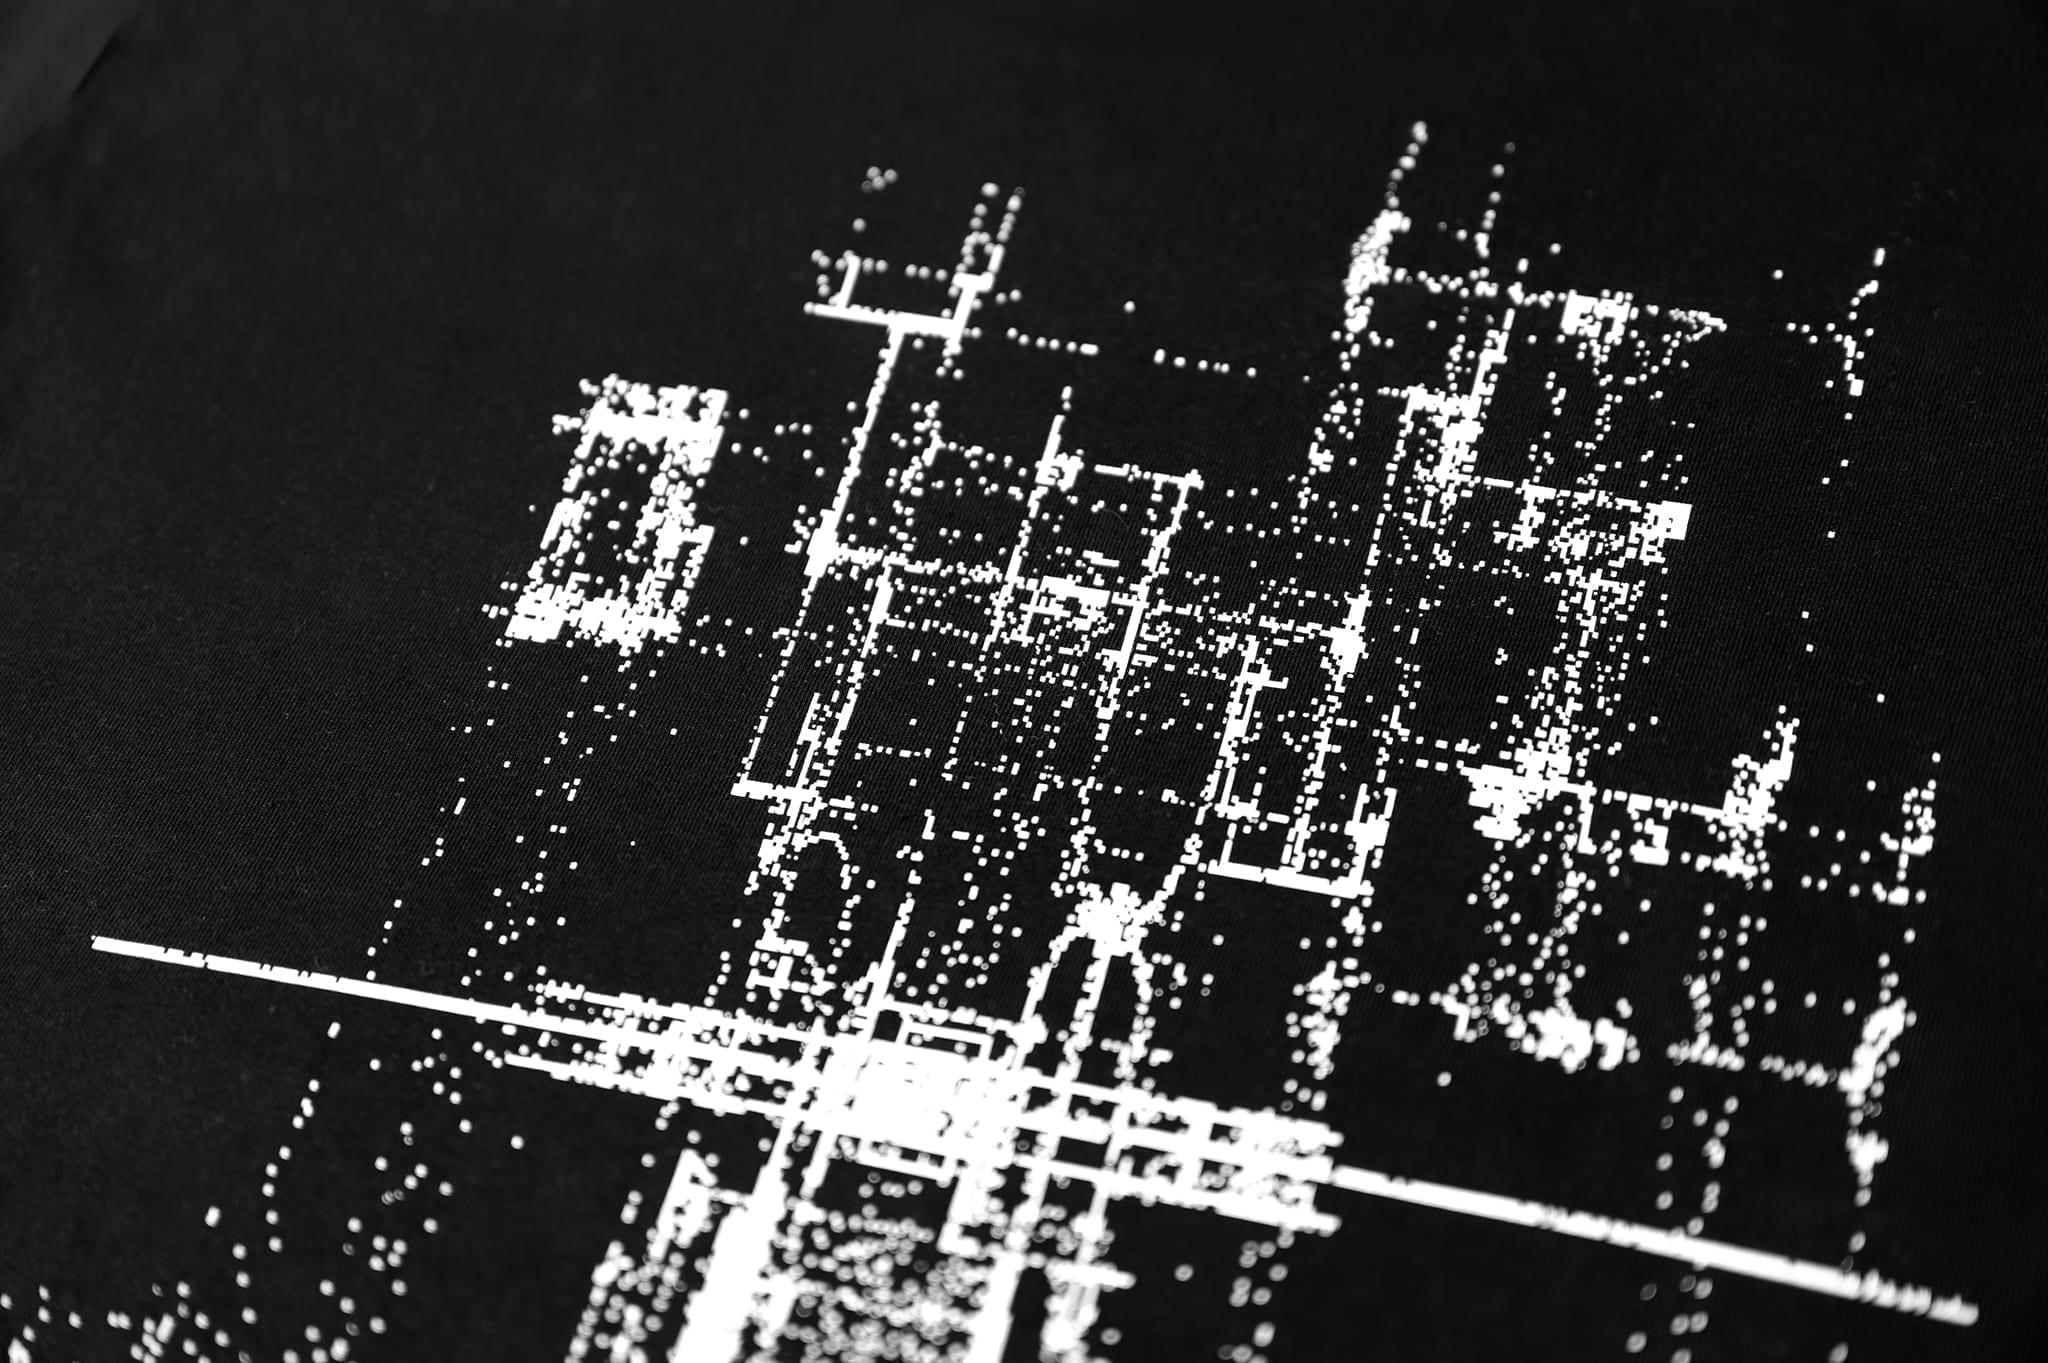 Audio Generated PixelArt Men's T-shirt by Alex Halka for feeder.ro